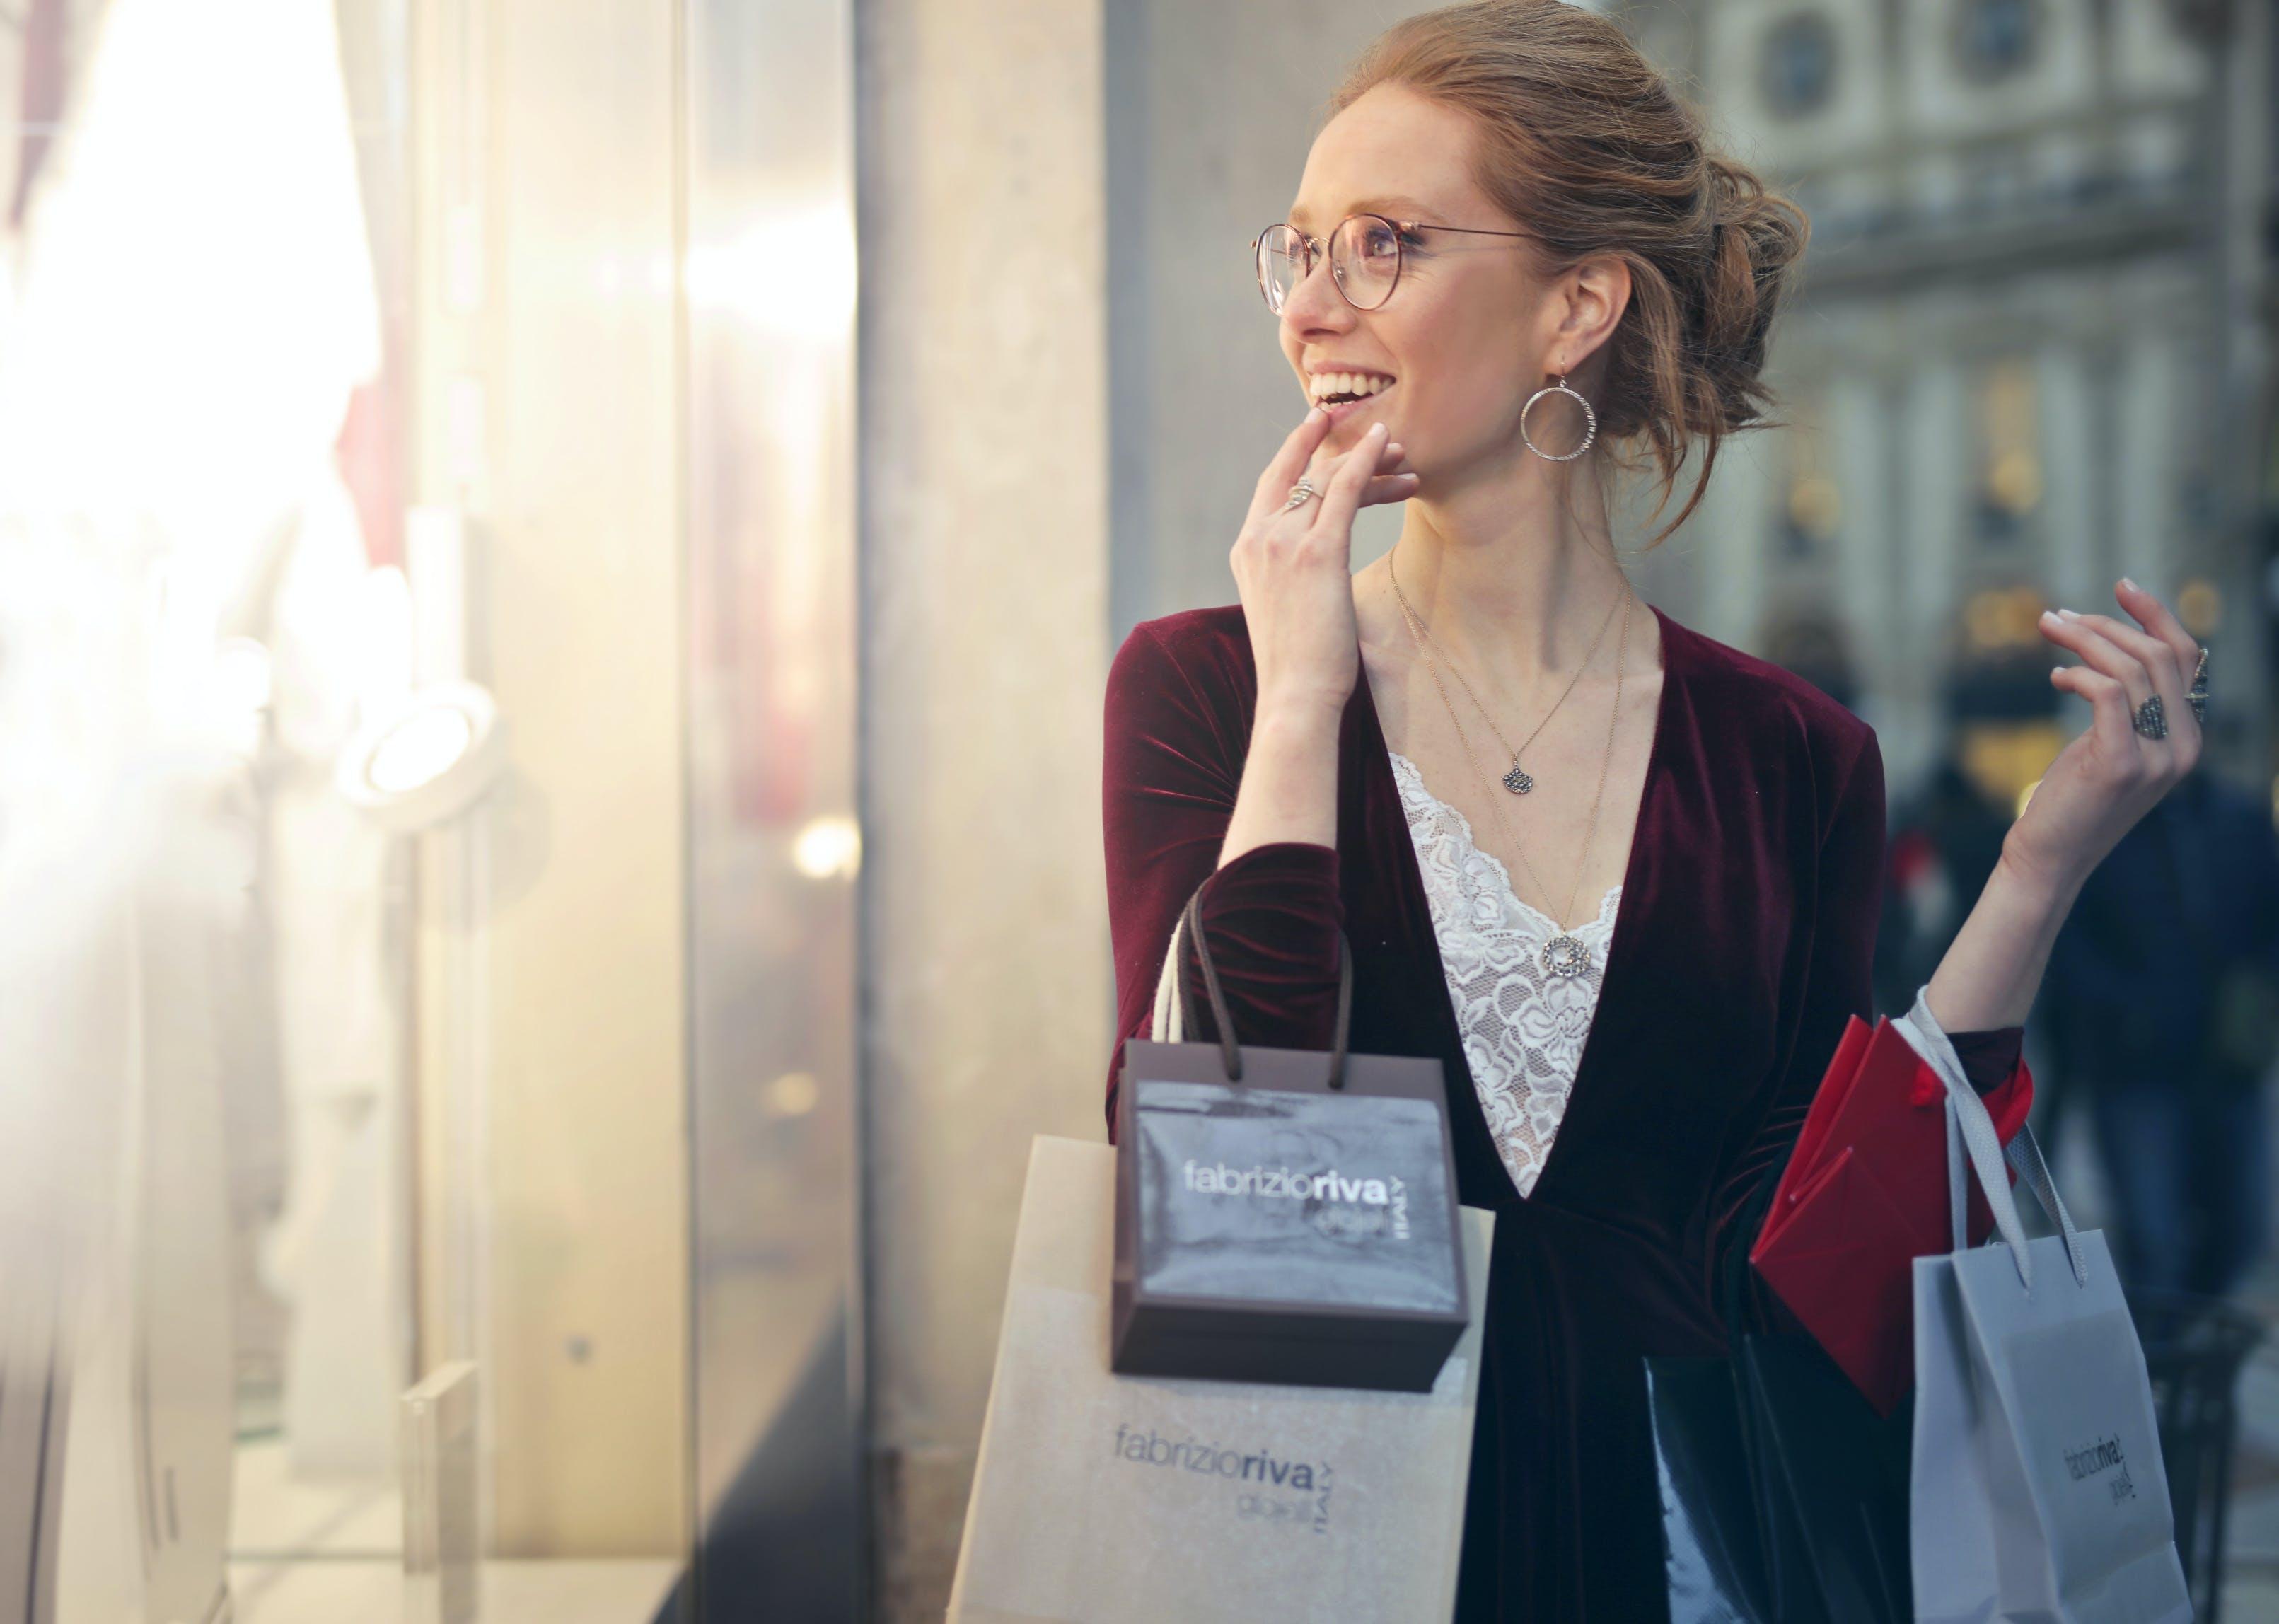 Kostenloses Stock Foto zu fashion, person, frau, beleuchtung